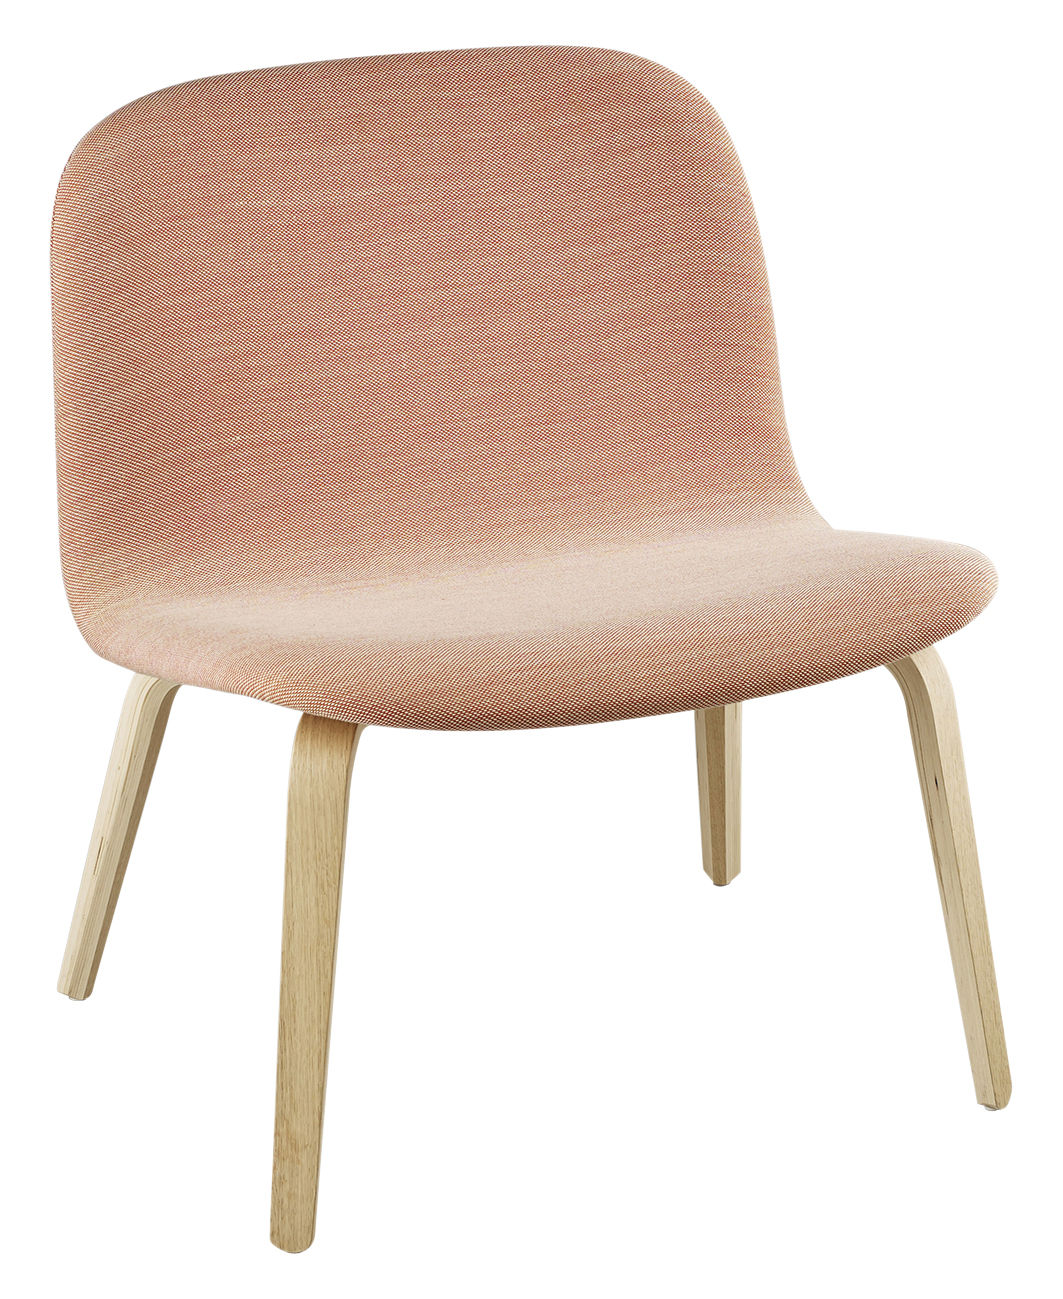 Möbel - Lounge Sessel - Visu Lounge Sessel / Stoff-Version - Sitzfläche H 35 cm - Muuto - Gestell Holz / Bezug rosa - bemaltes Holz, Kvadrat-Gewebe